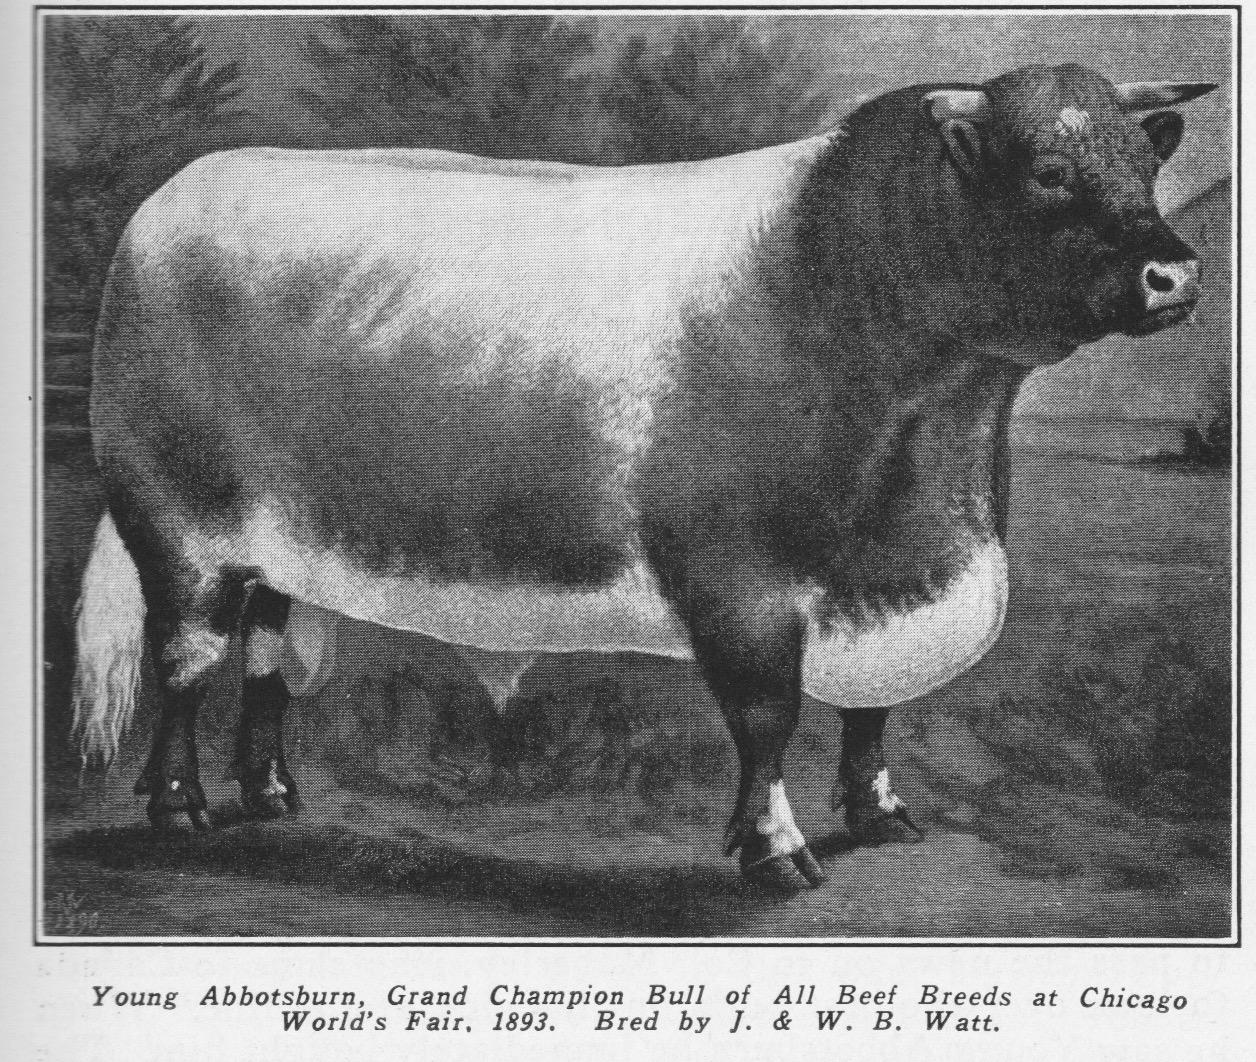 Young Abbotsburn, 1893